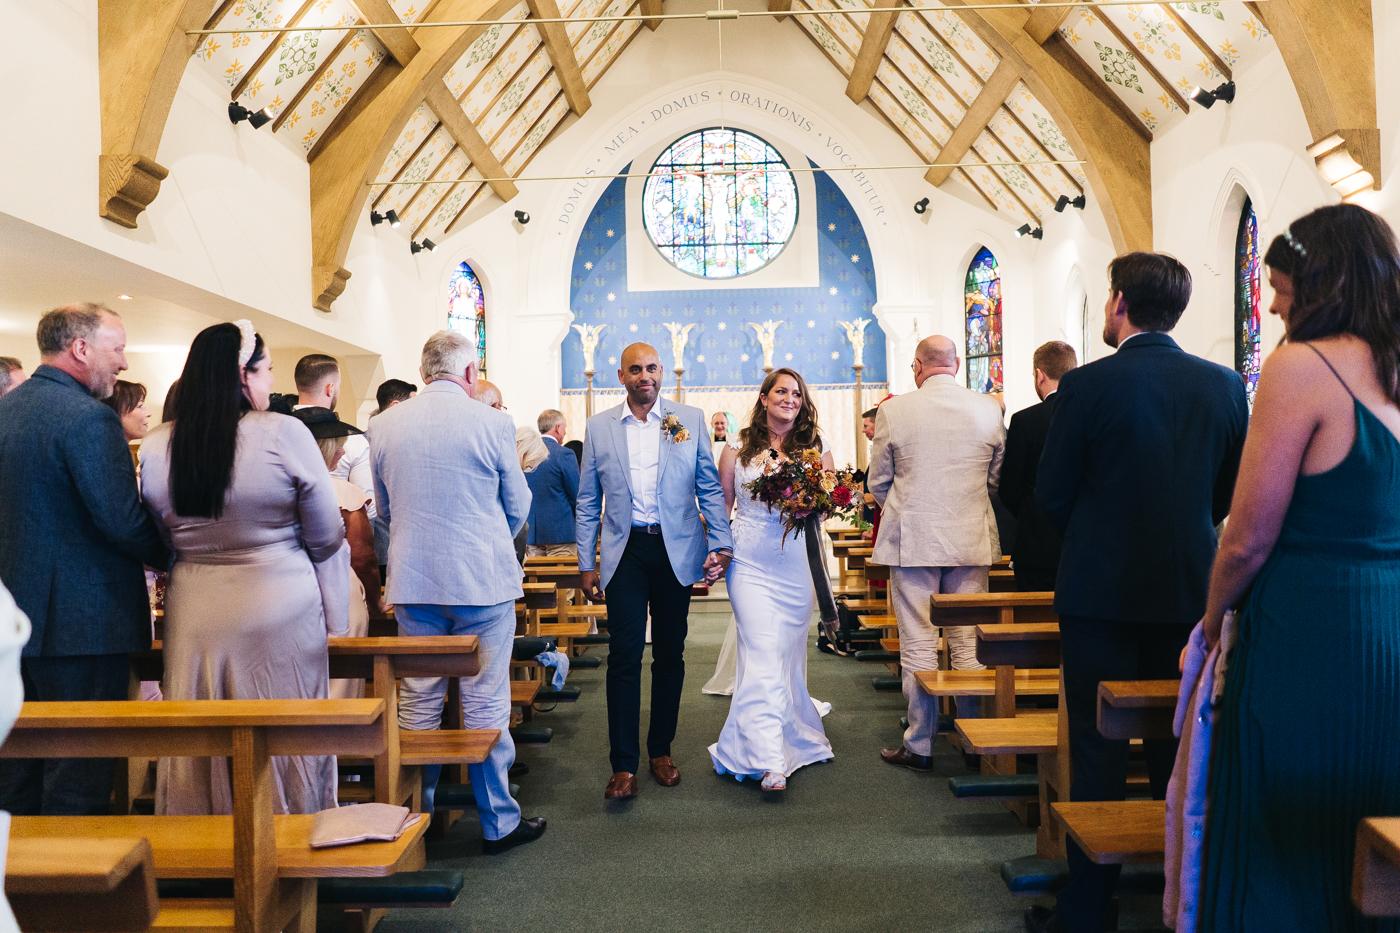 wedding-at-the-pheasant-harome-helmsley-north-yorkshire-wedding-photographer-0018.jpg